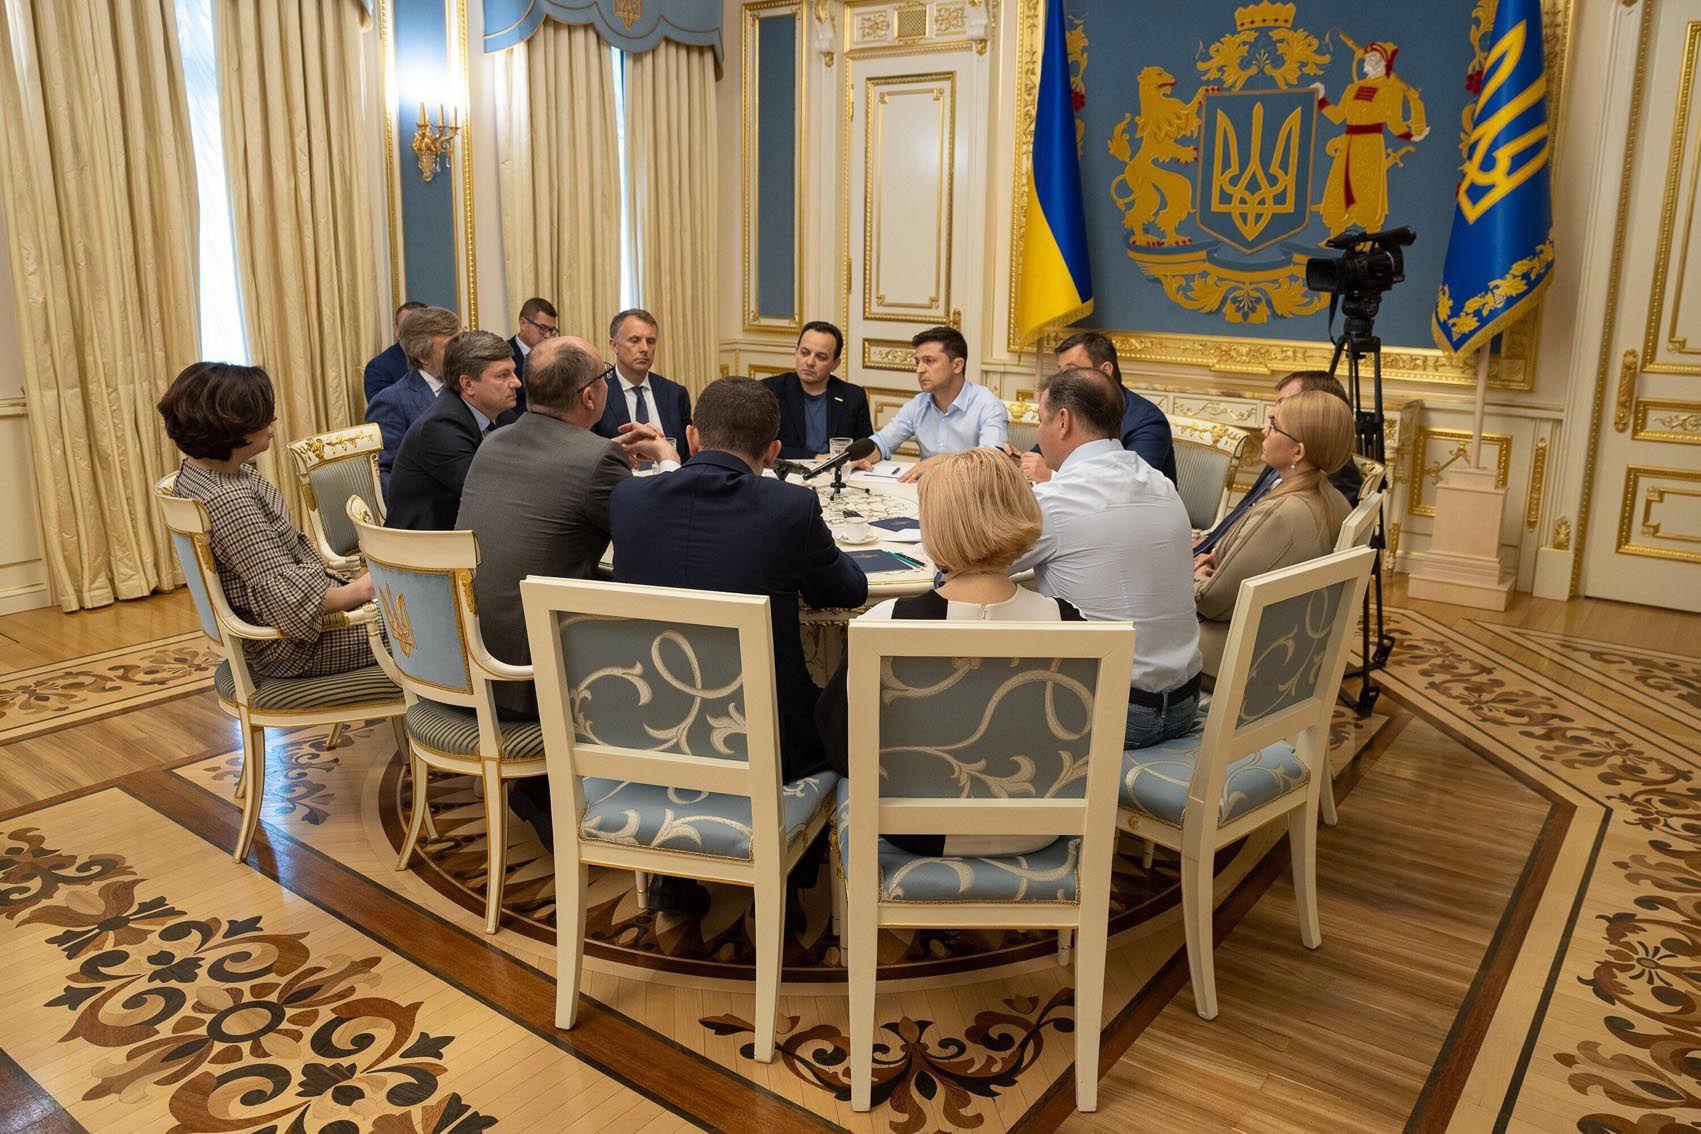 Президент України своїм Указом призначив позачергові вибори у Верховну Раду на 21 липня 2019 року